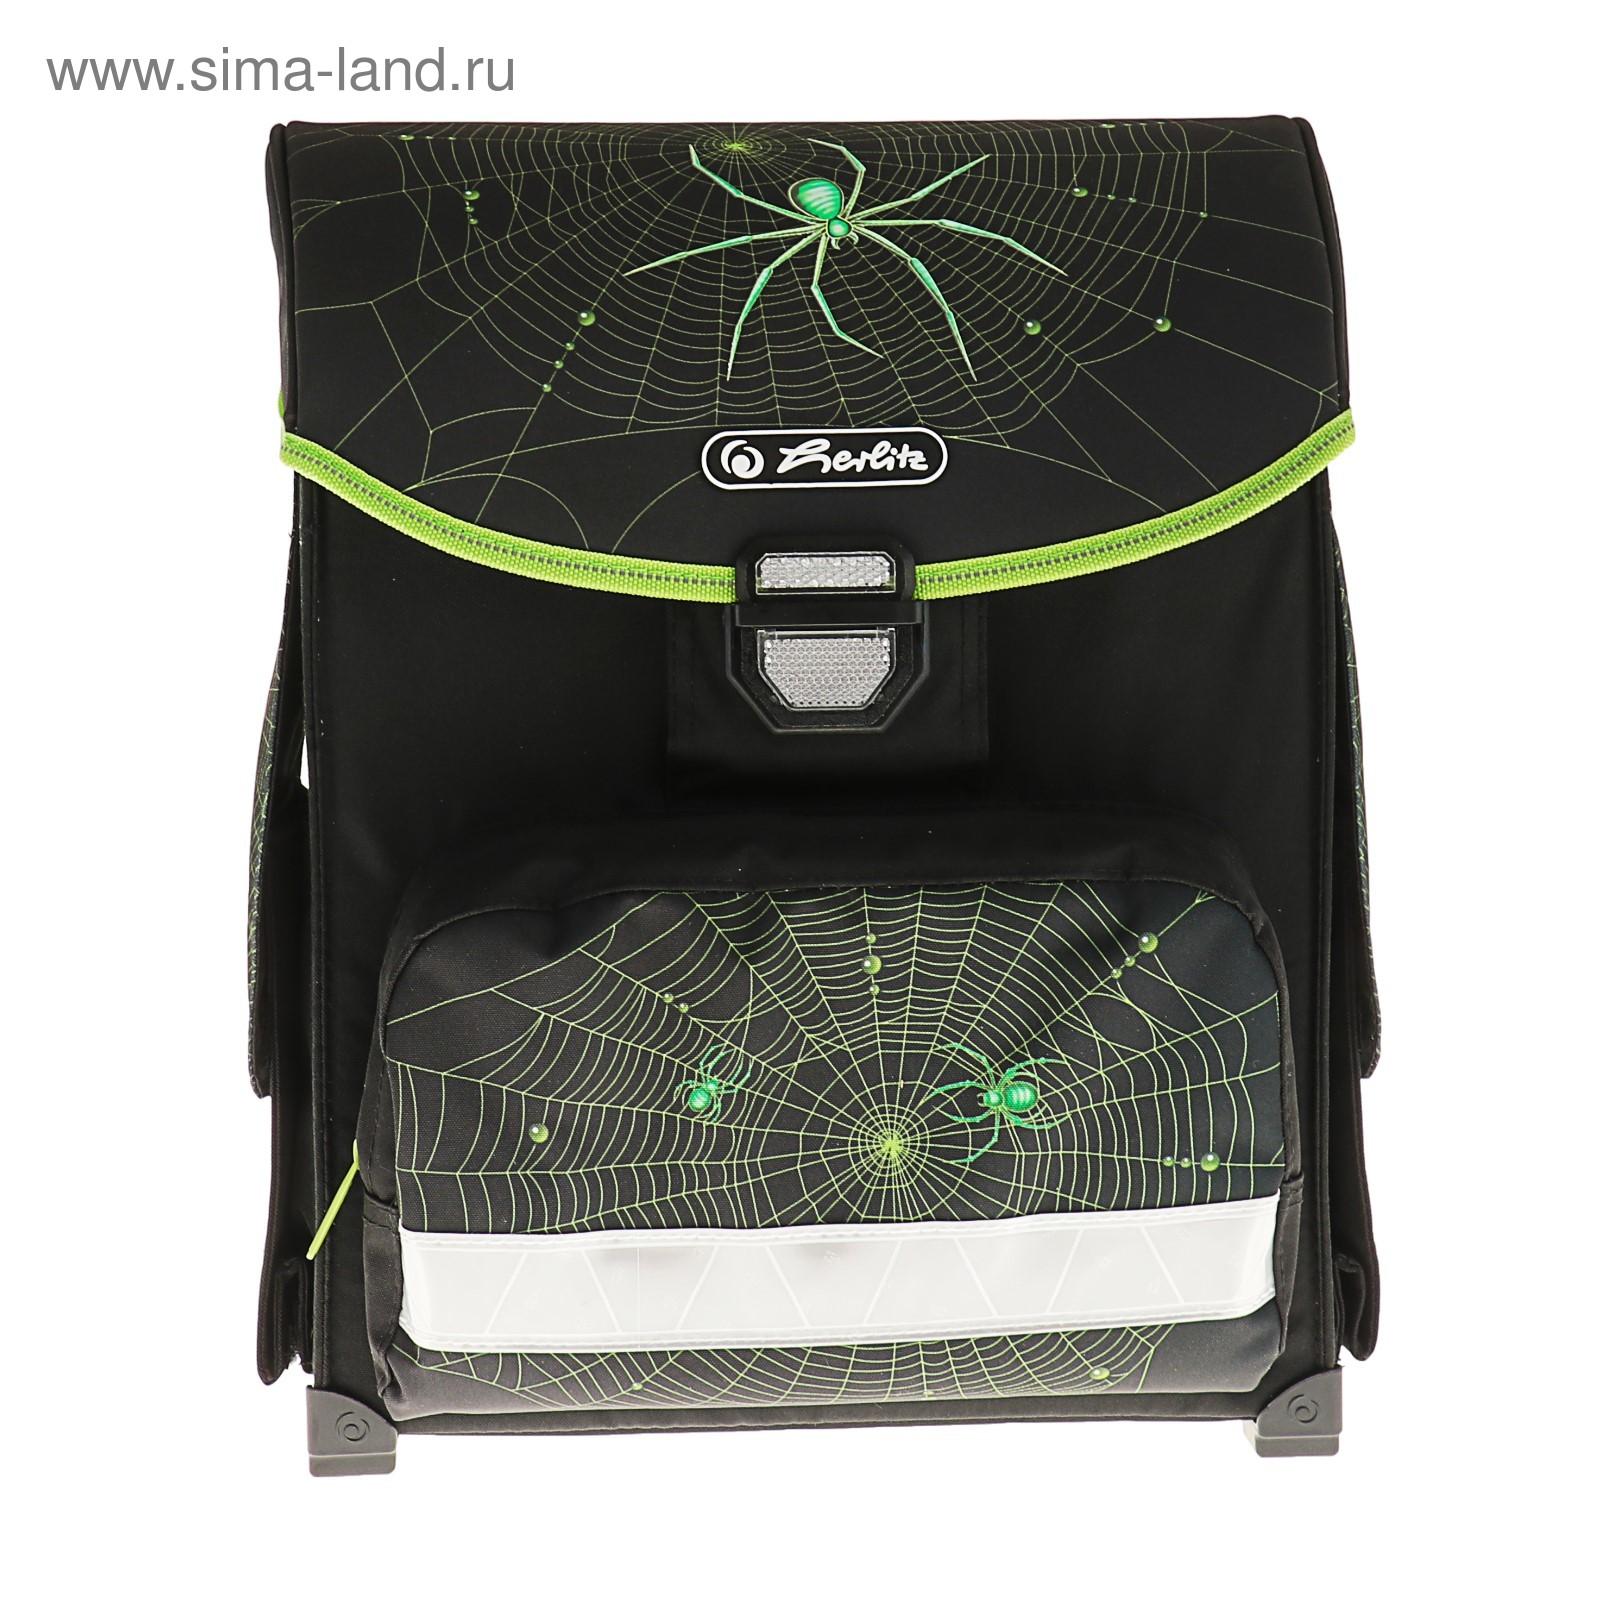 dd685f655d4e Ранец на замке Herlitz SMART 38х30х21 см, для мальчиков, Spider, чёрный